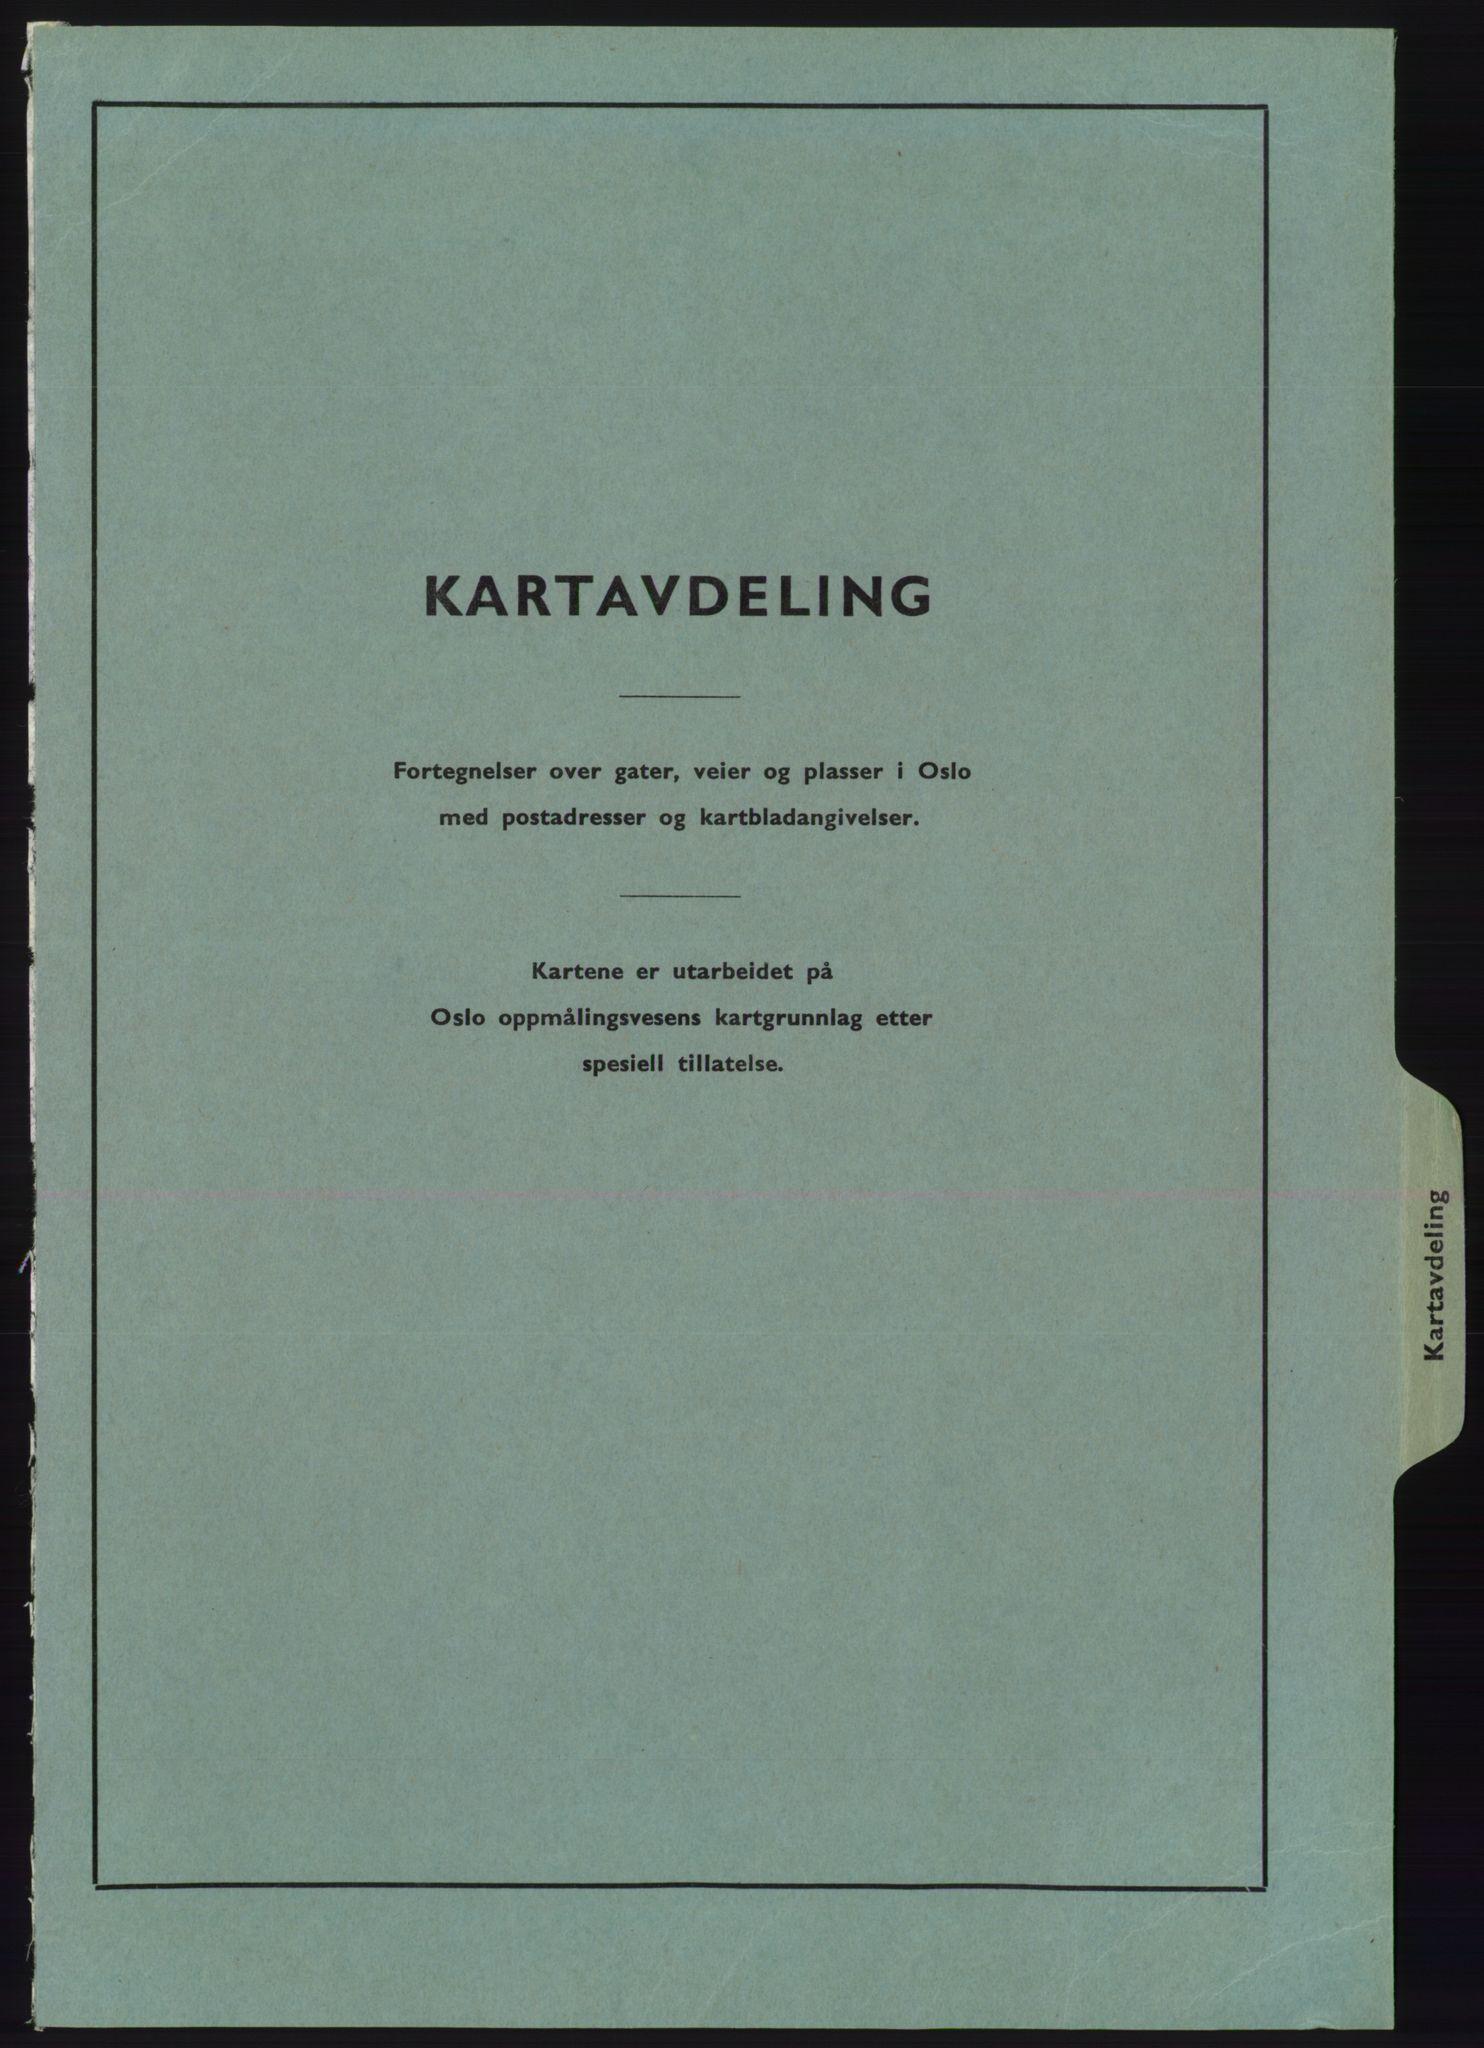 PUBL, Kristiania/Oslo adressebok, 1975-1976